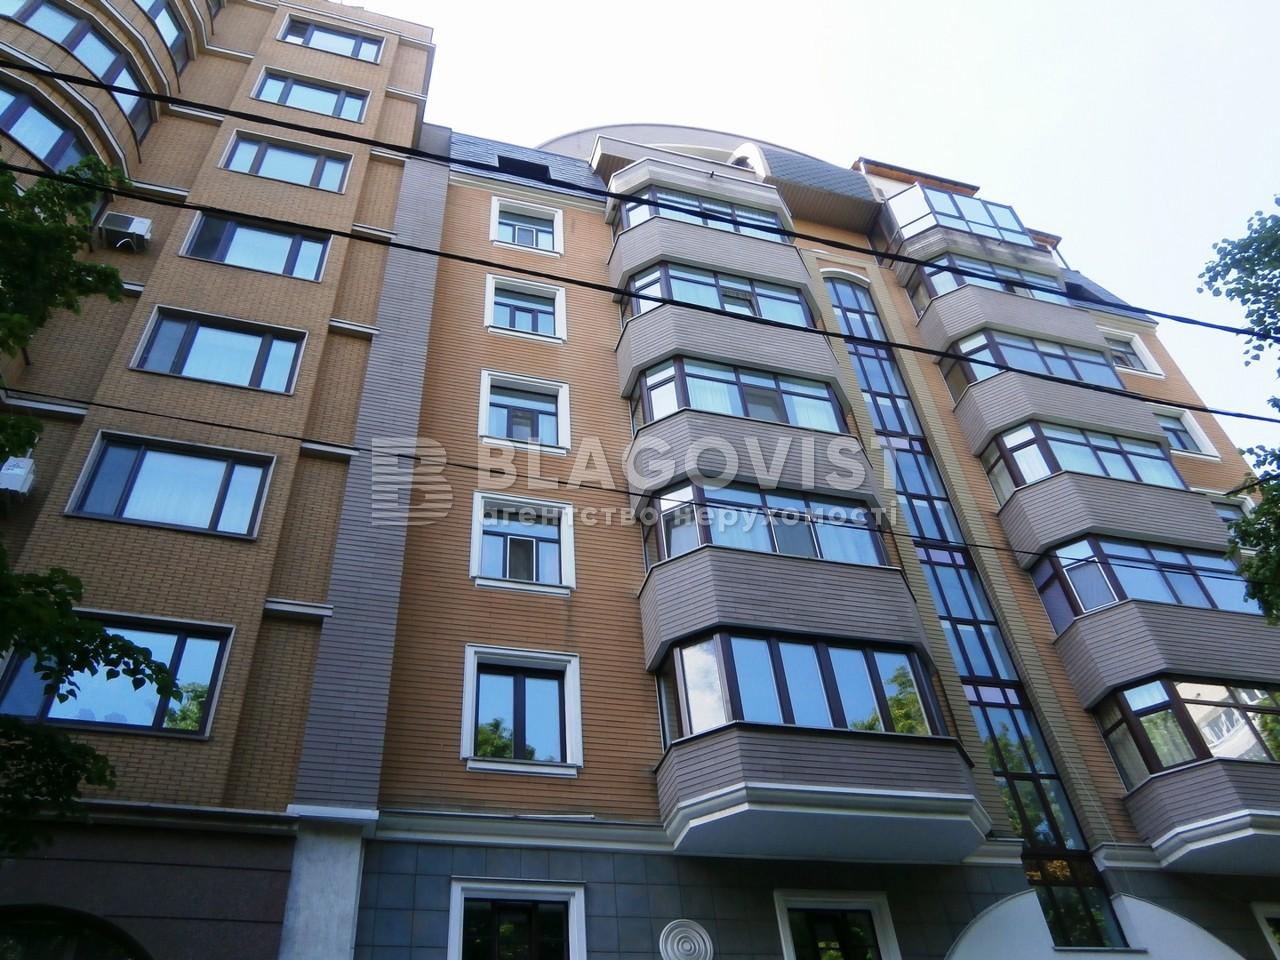 Квартира M-37458, Кропивницкого, 8, Киев - Фото 1